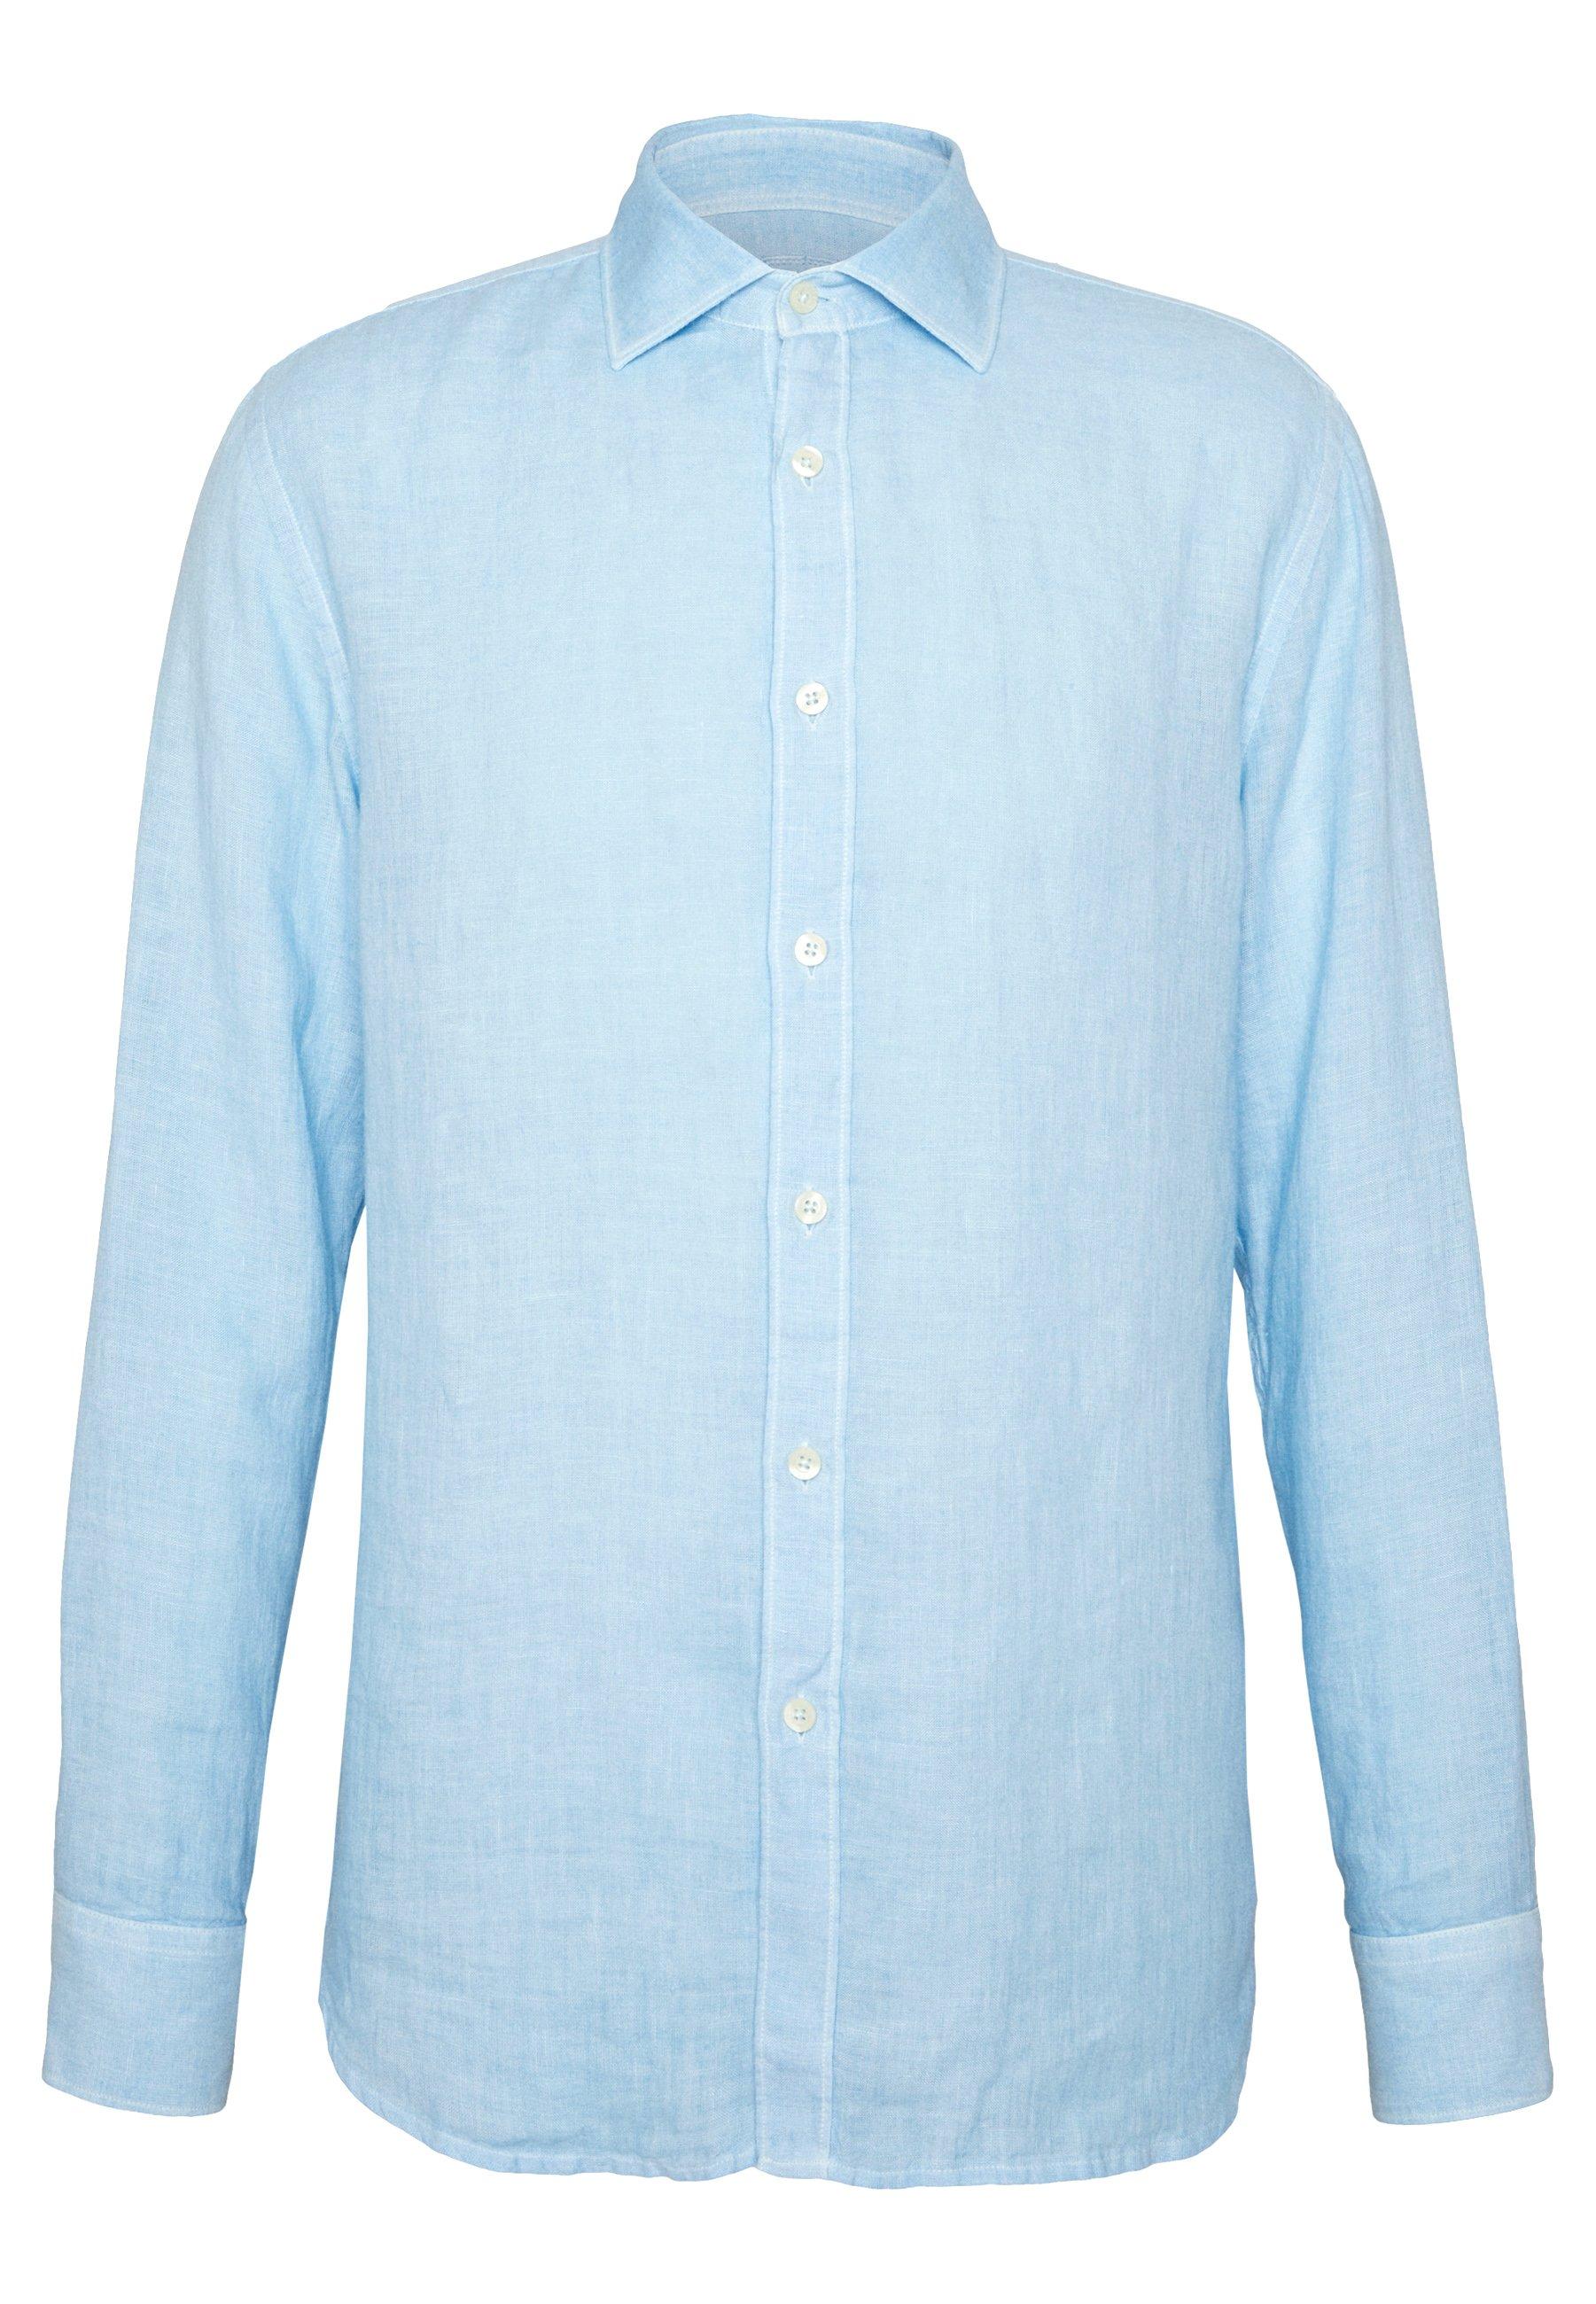 120% Lino Chemise - blue soft fade